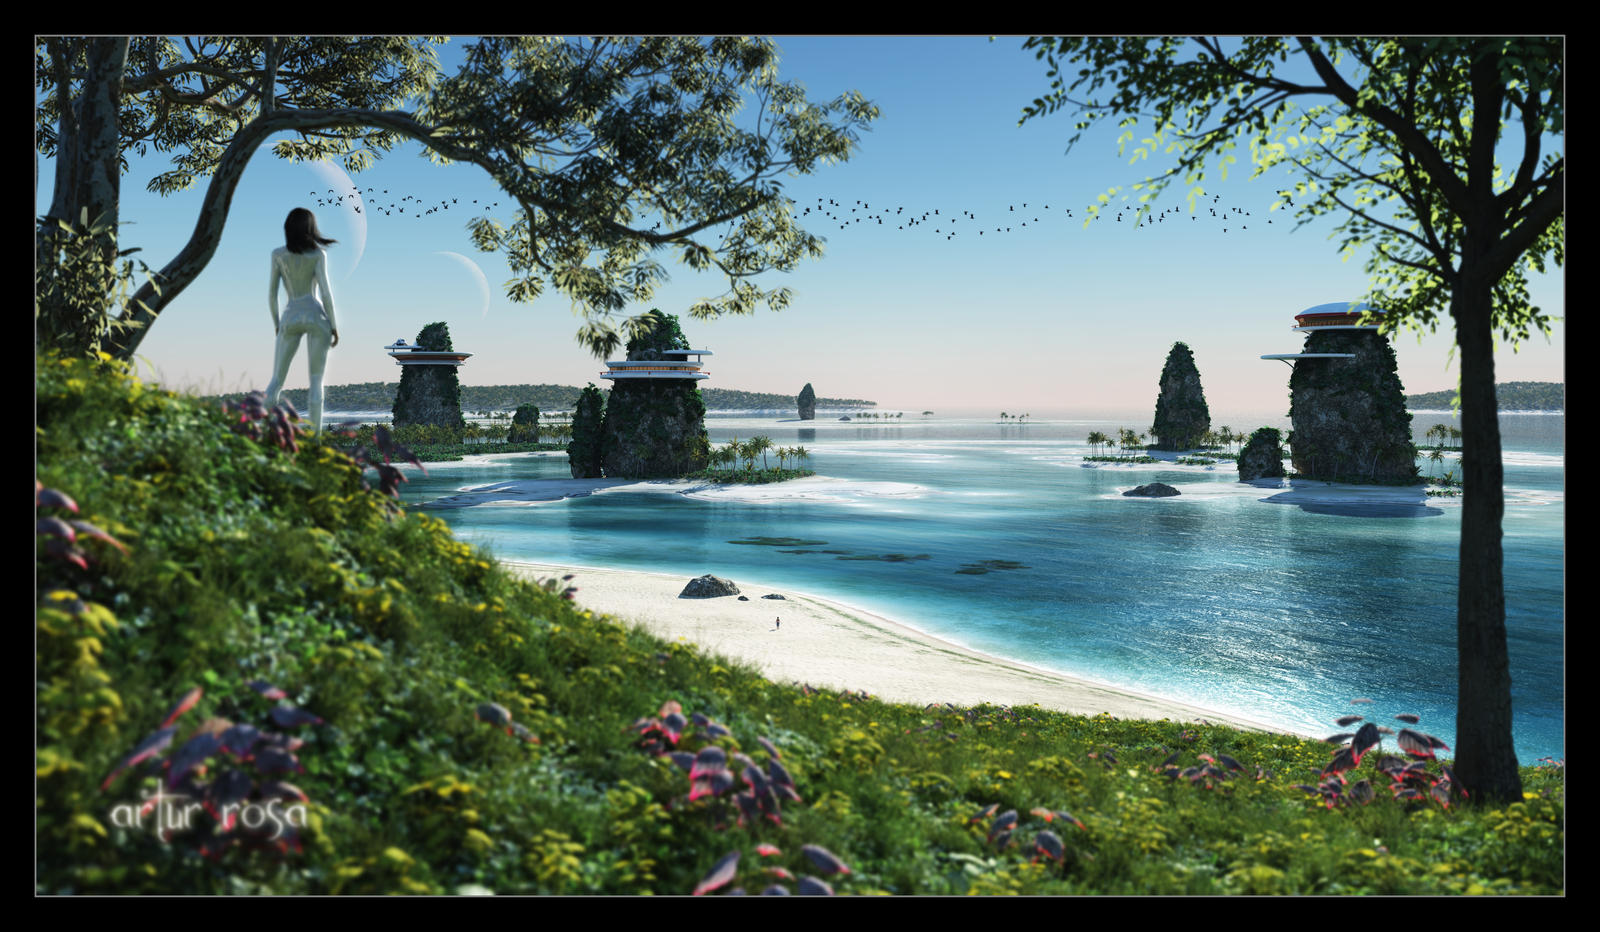 Archipelago 27 by ArthurBlue